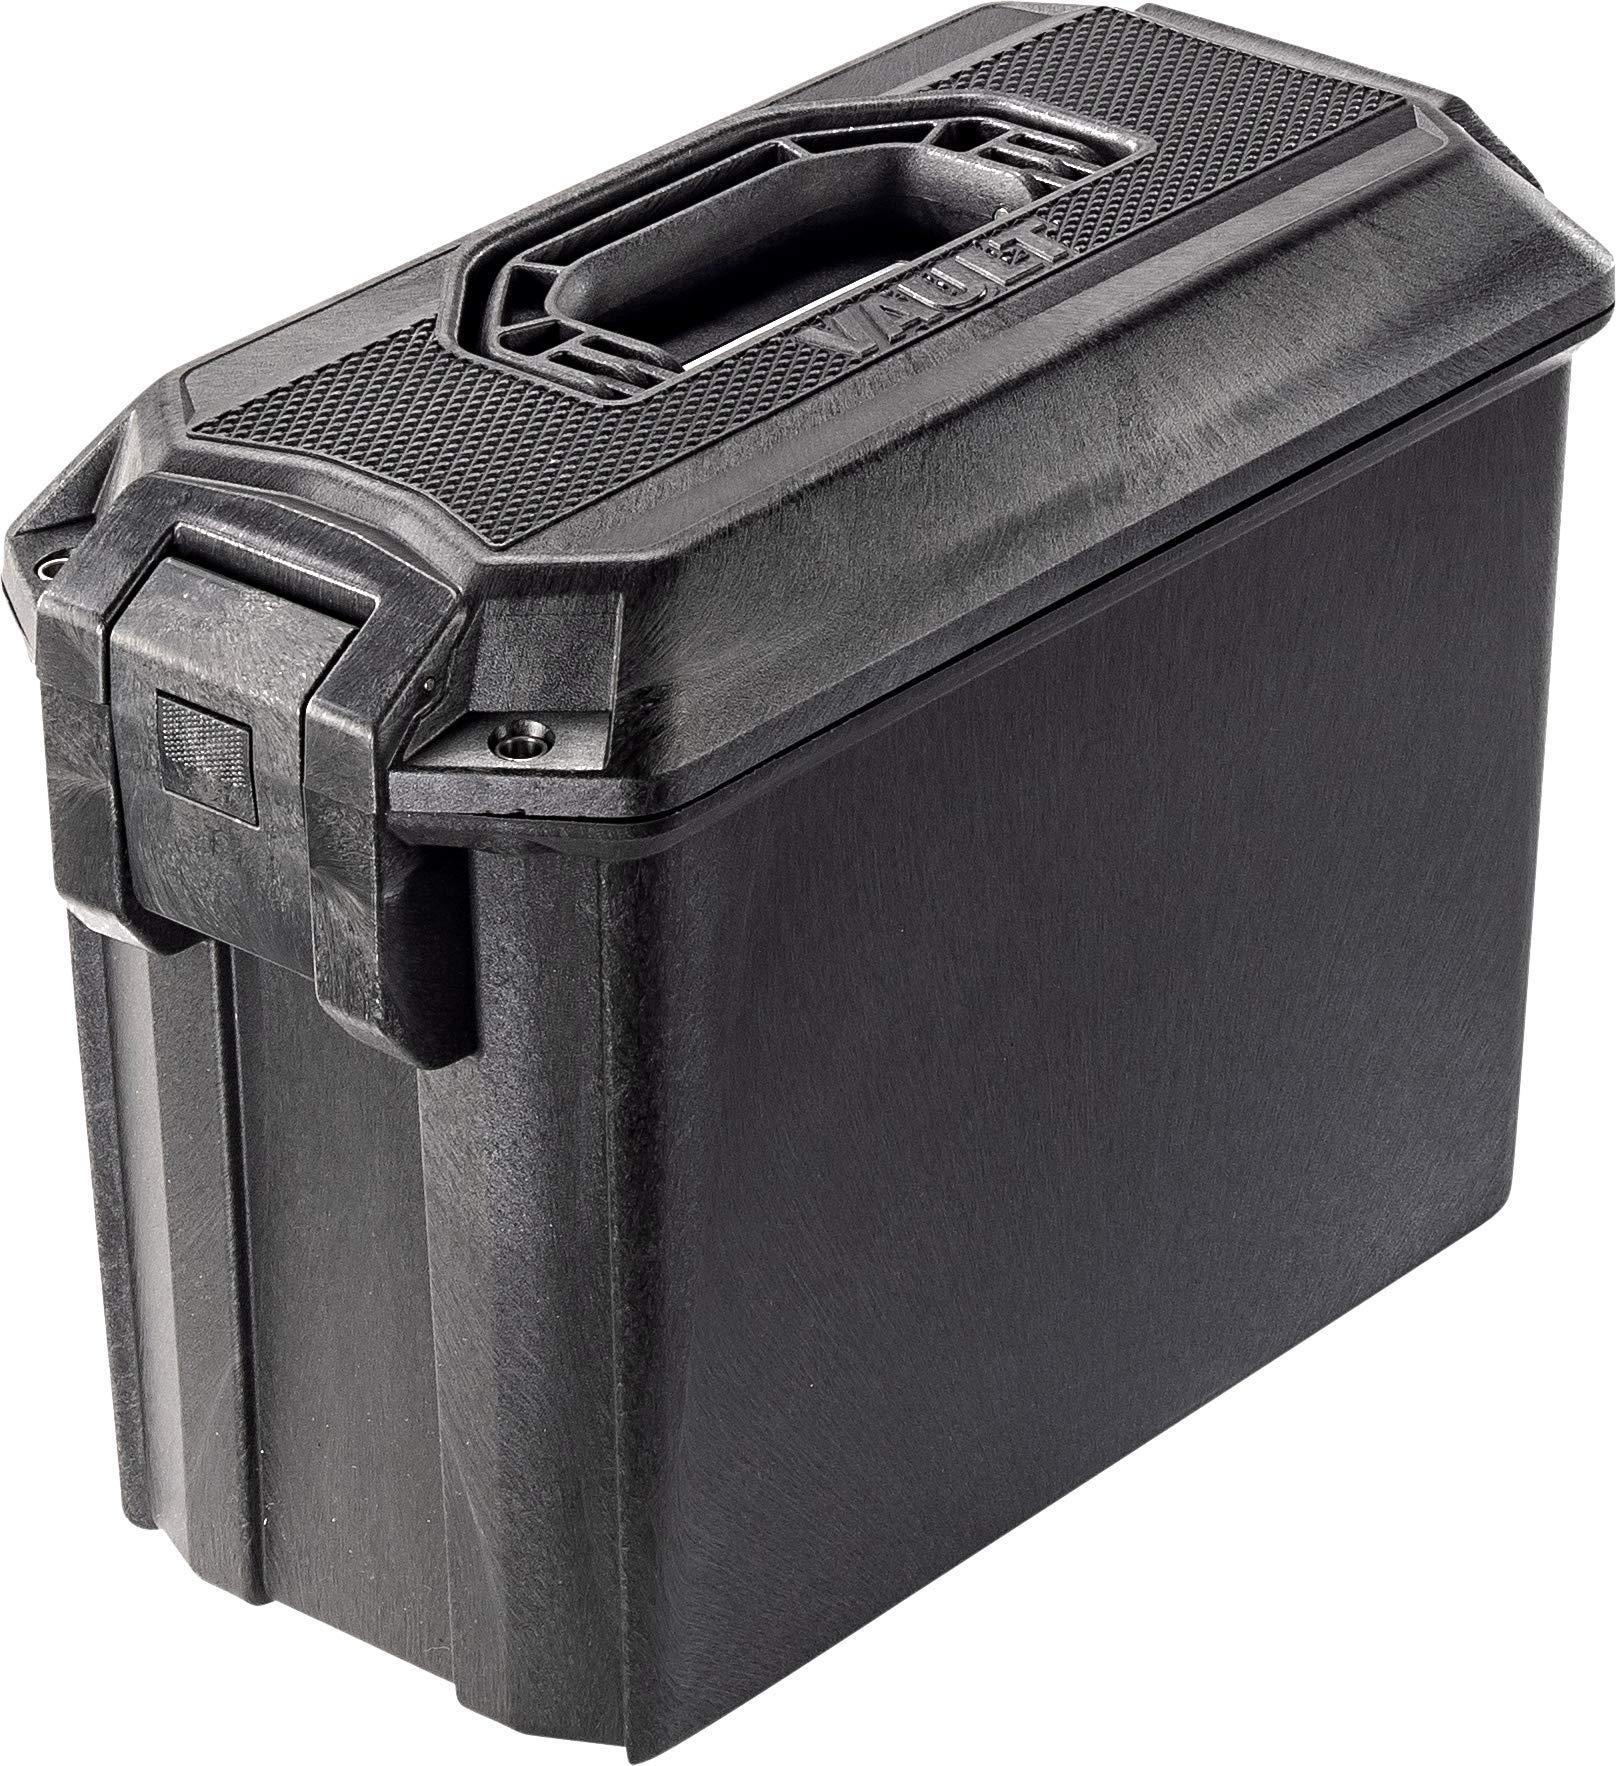 Pelican VCV250-0010-BLK V250 Ammo Case Black w/No Foam by Pelican